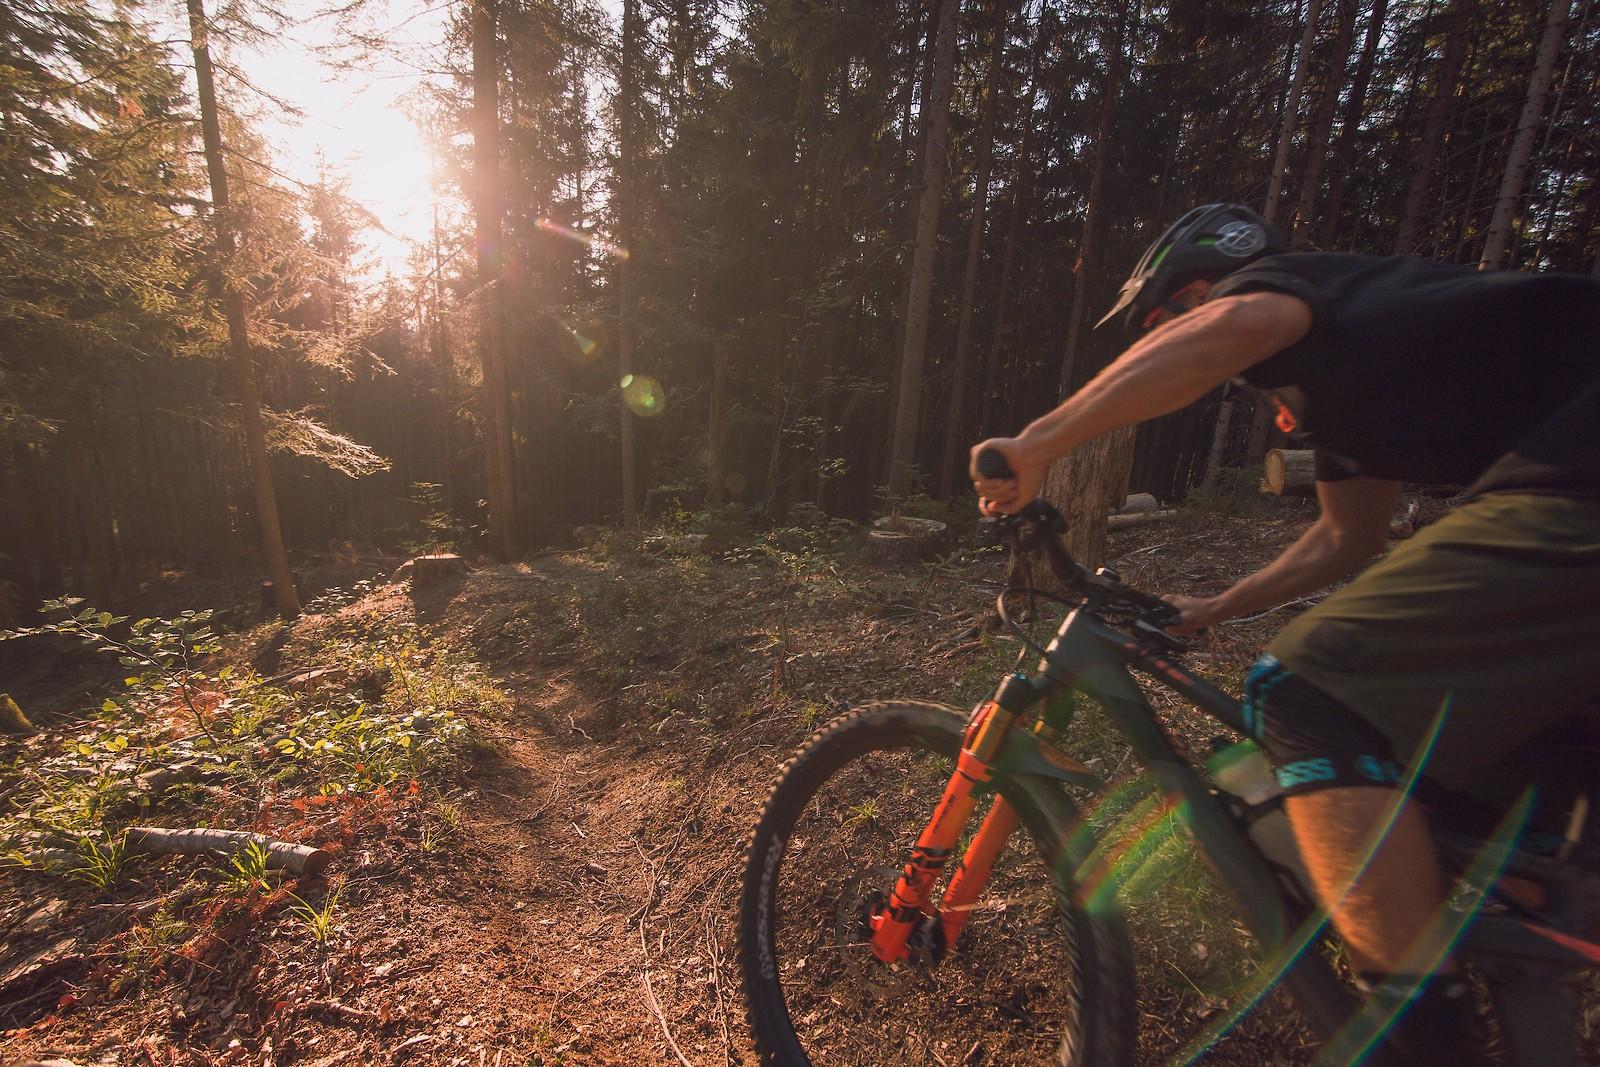 Into the sun - johnseehu - Mountain Biking Pictures - Vital MTB